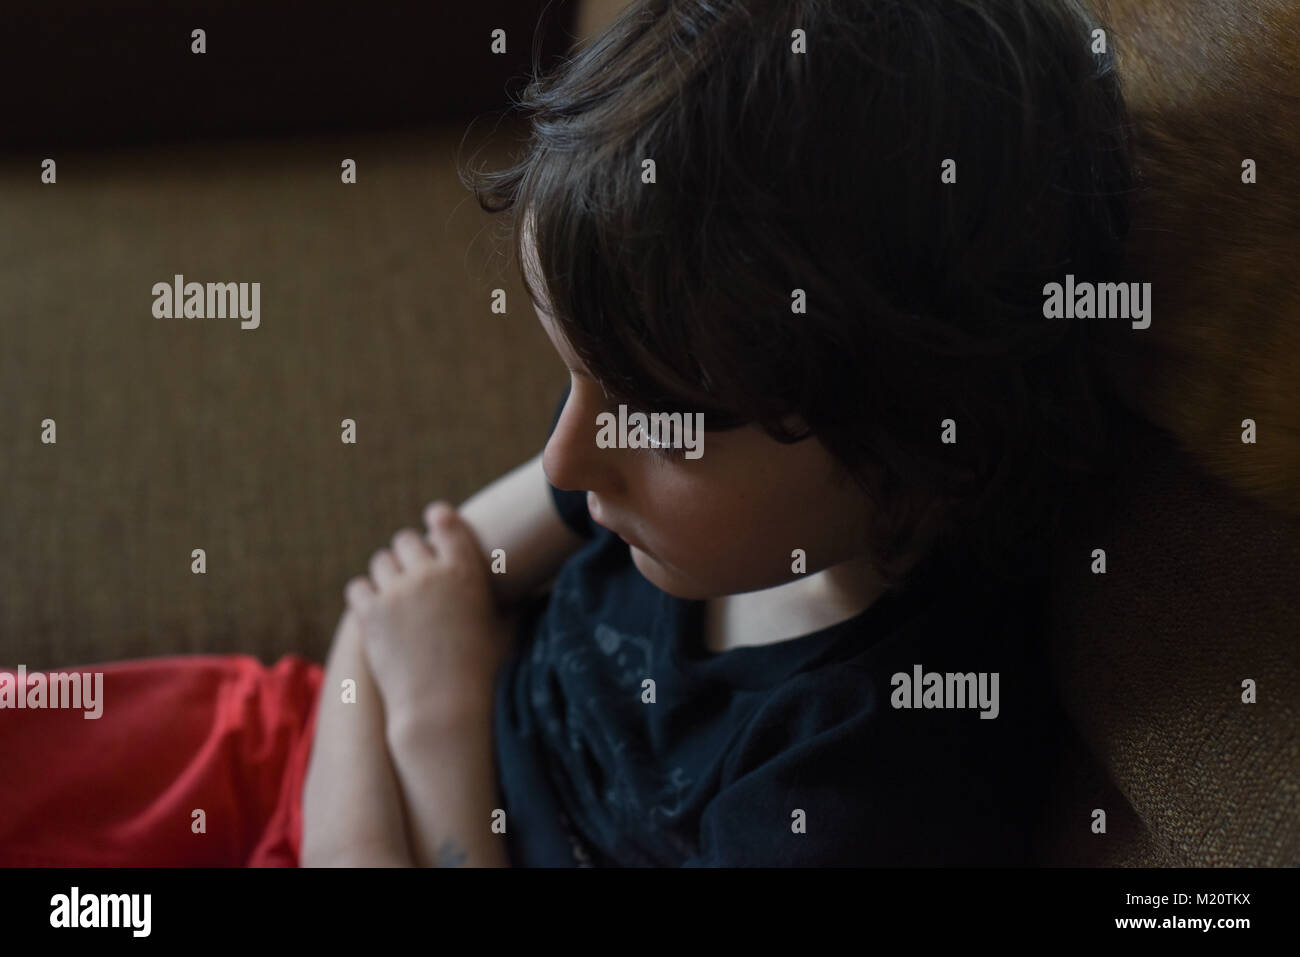 Niño triste Imagen De Stock